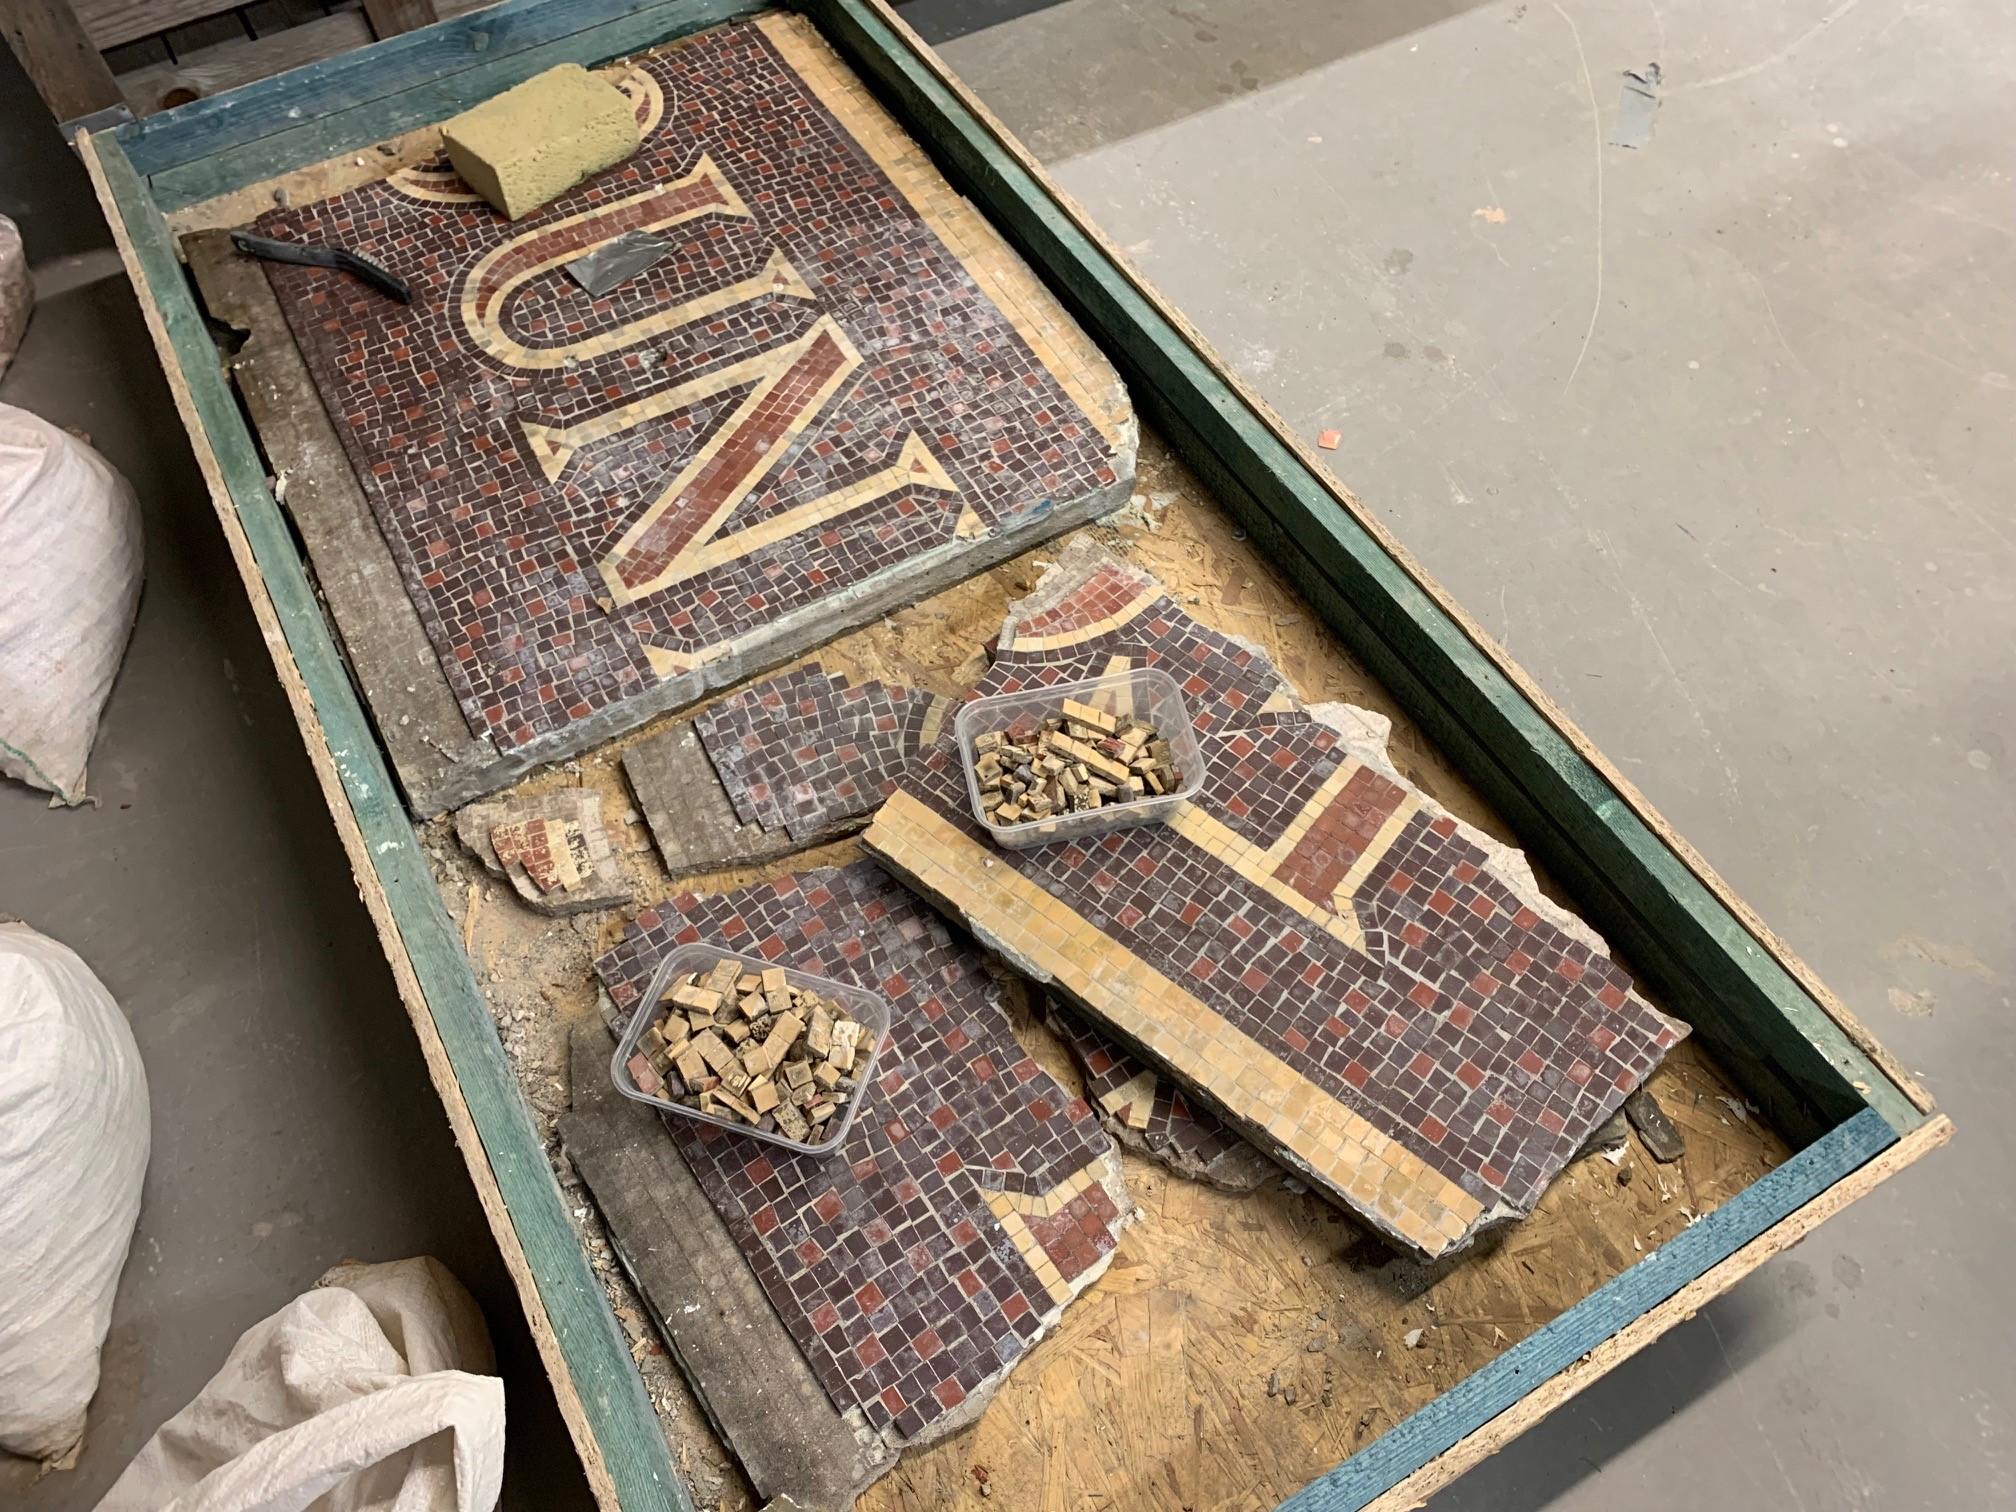 Mosaic Restoration Inverness 2019 Projects